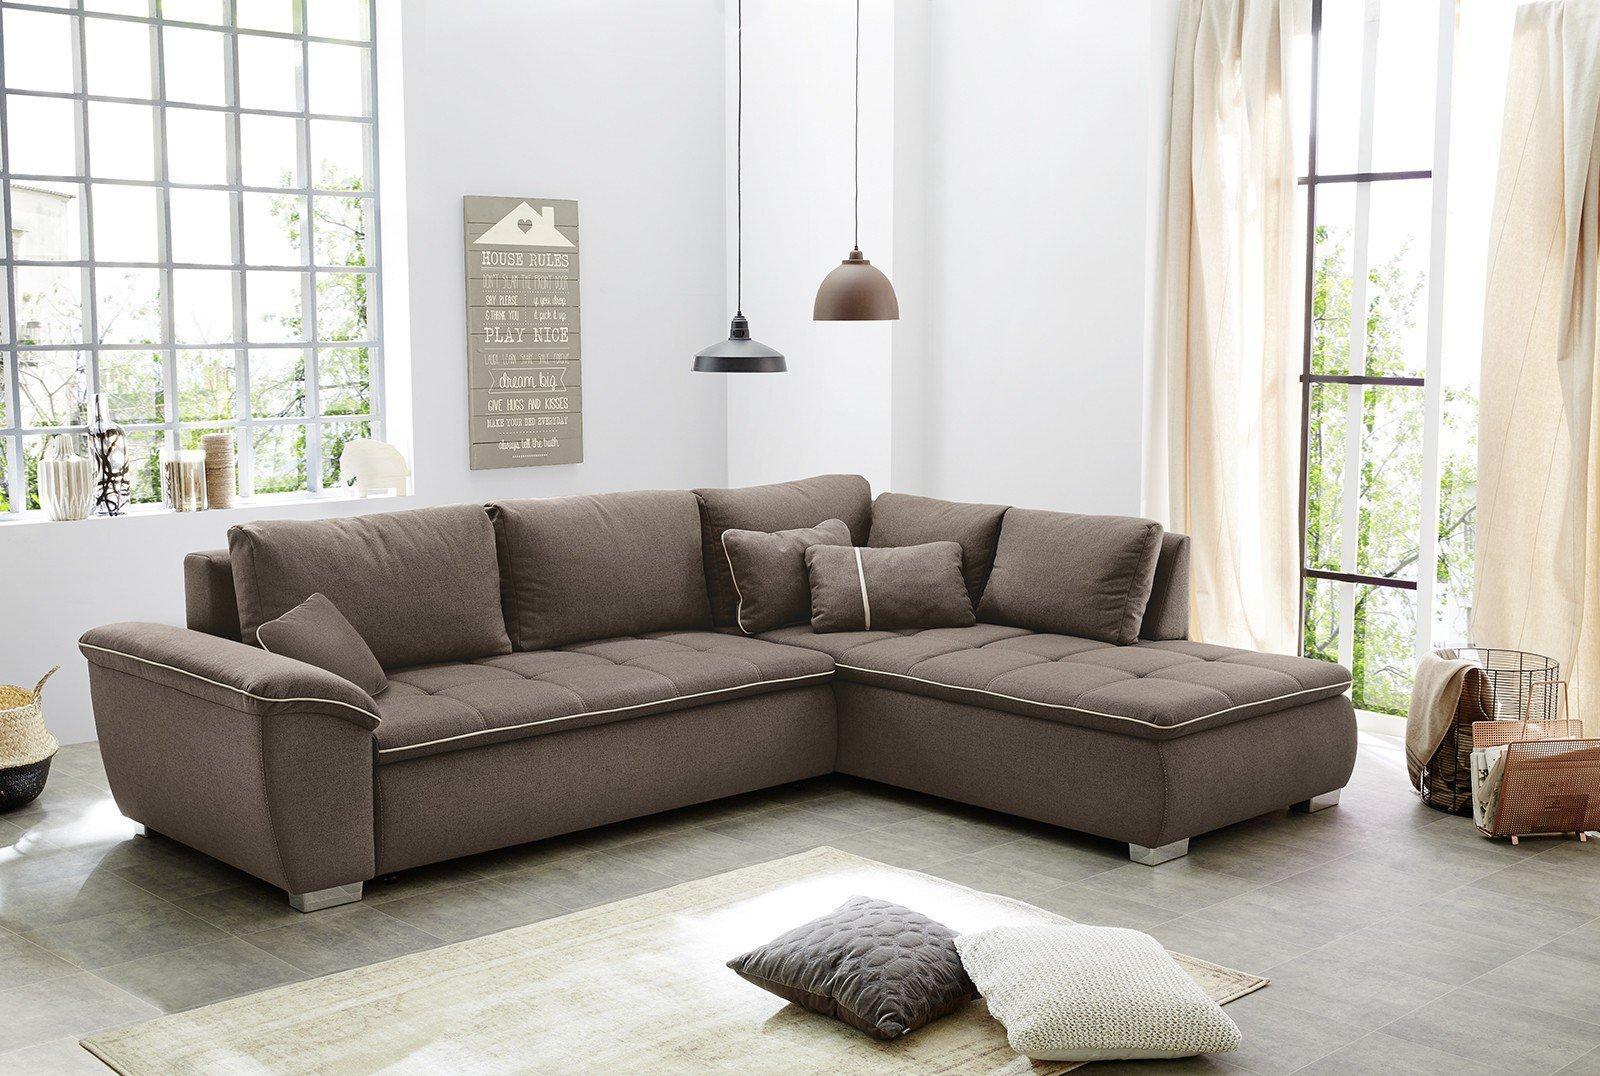 jockenh fer cordoba eckcouch braun m bel letz ihr online shop. Black Bedroom Furniture Sets. Home Design Ideas